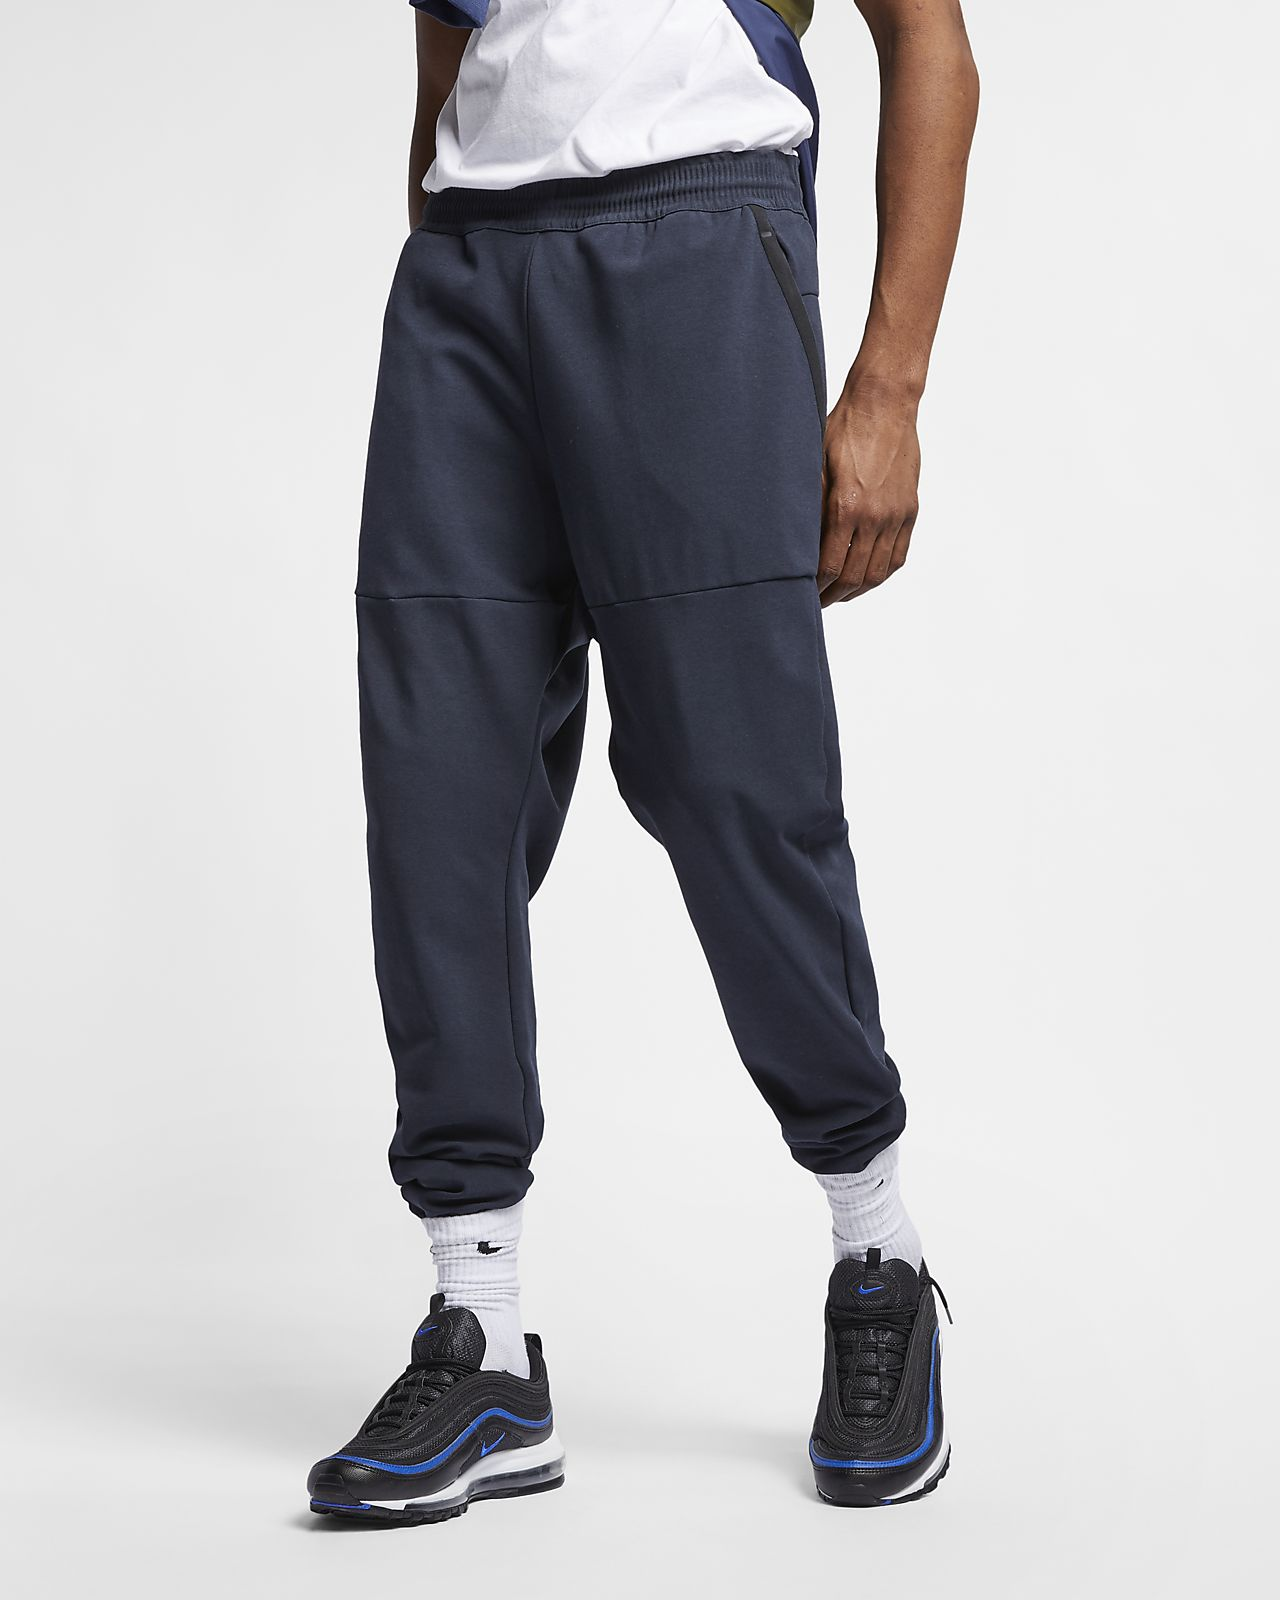 2da4ab225eded Maille En Pack Nike Homme Tech Pour Ca Sportswear Pantalon 6T5wqPw